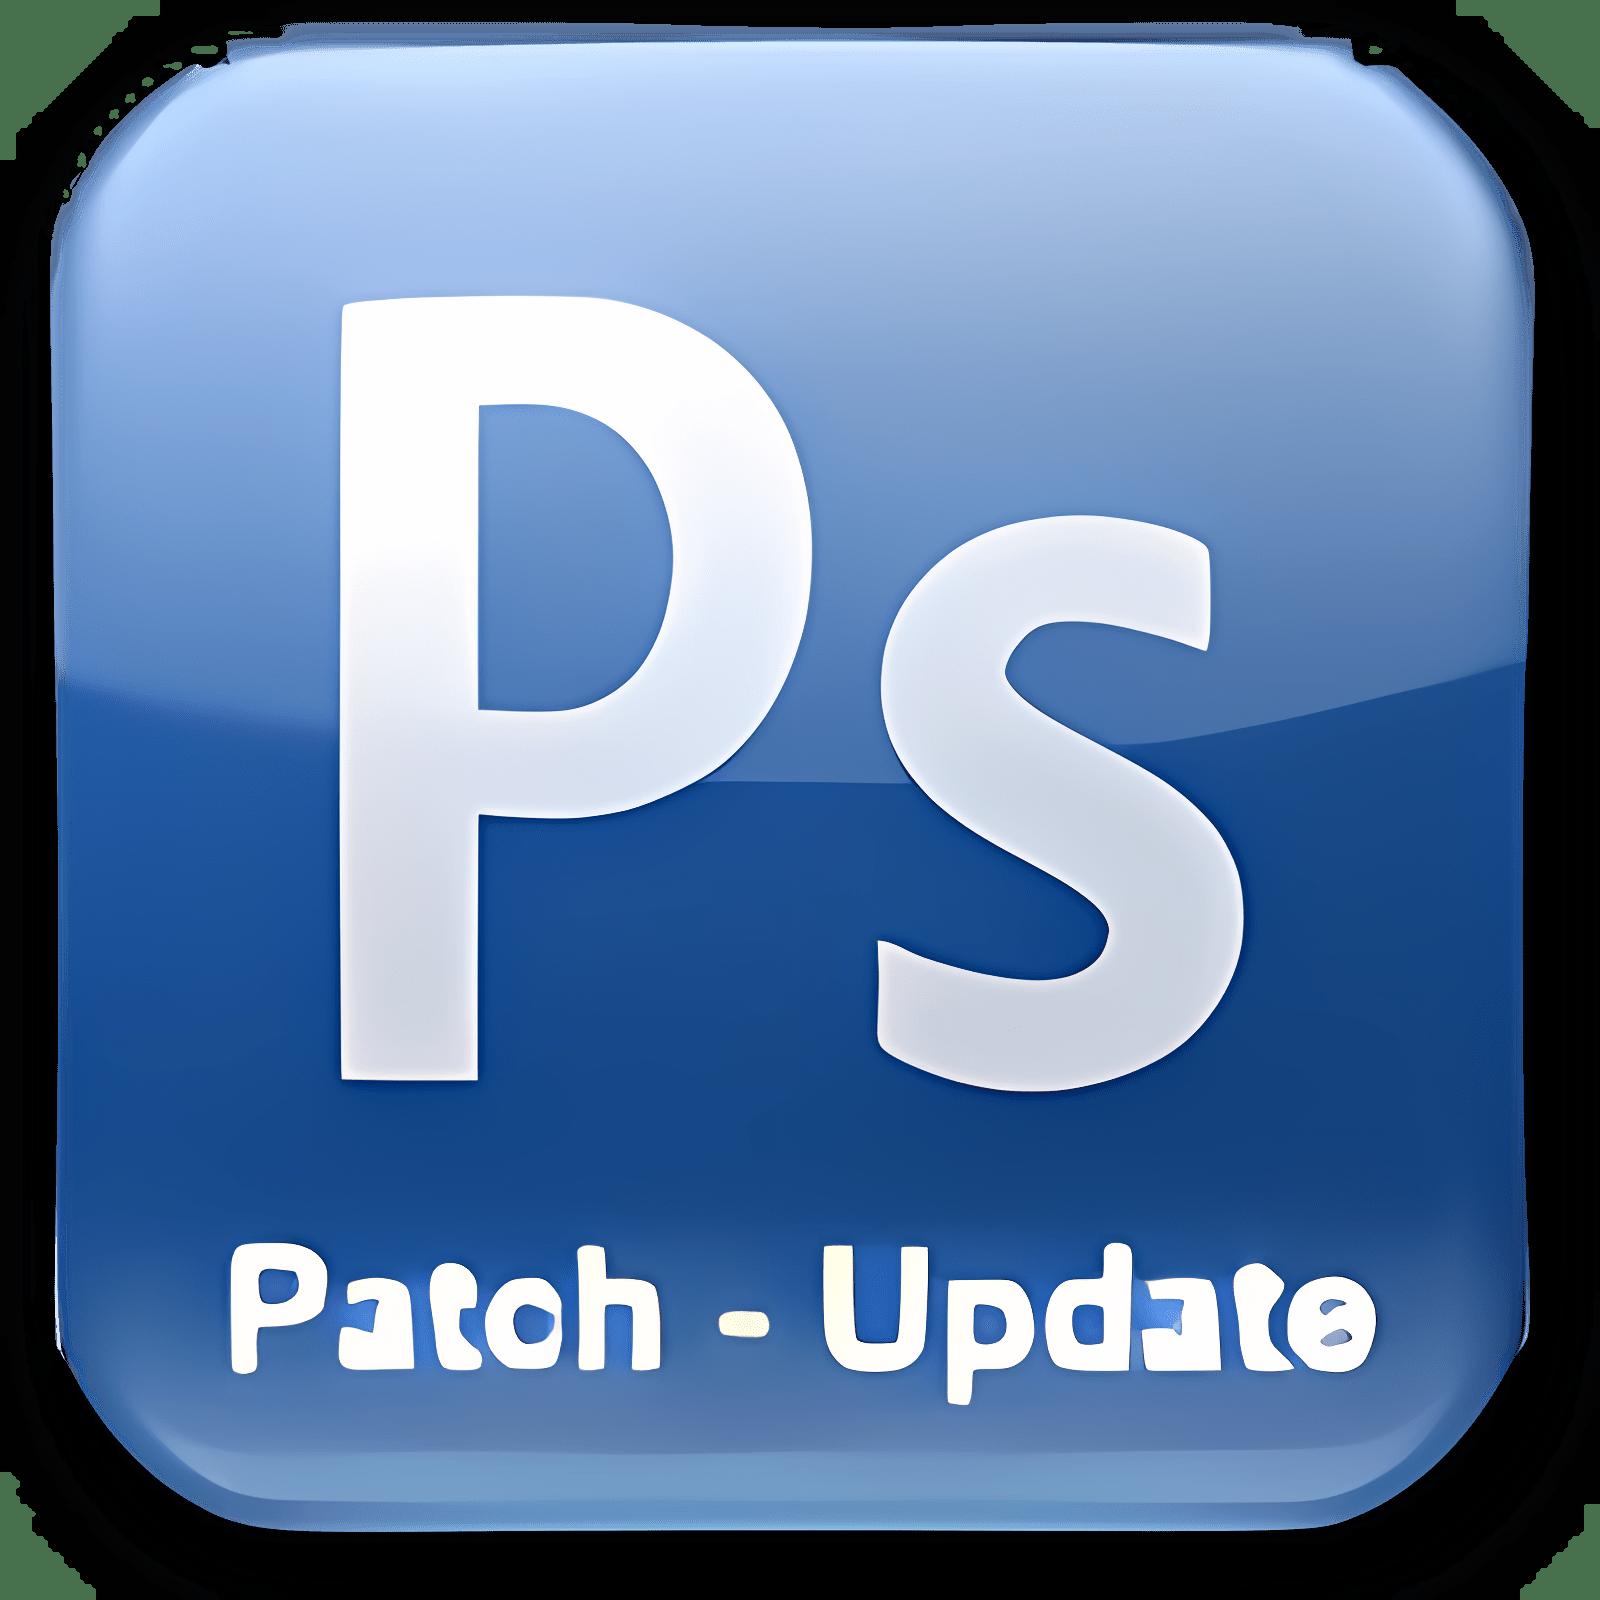 Adobe Photoshop CS3 Update for Mac